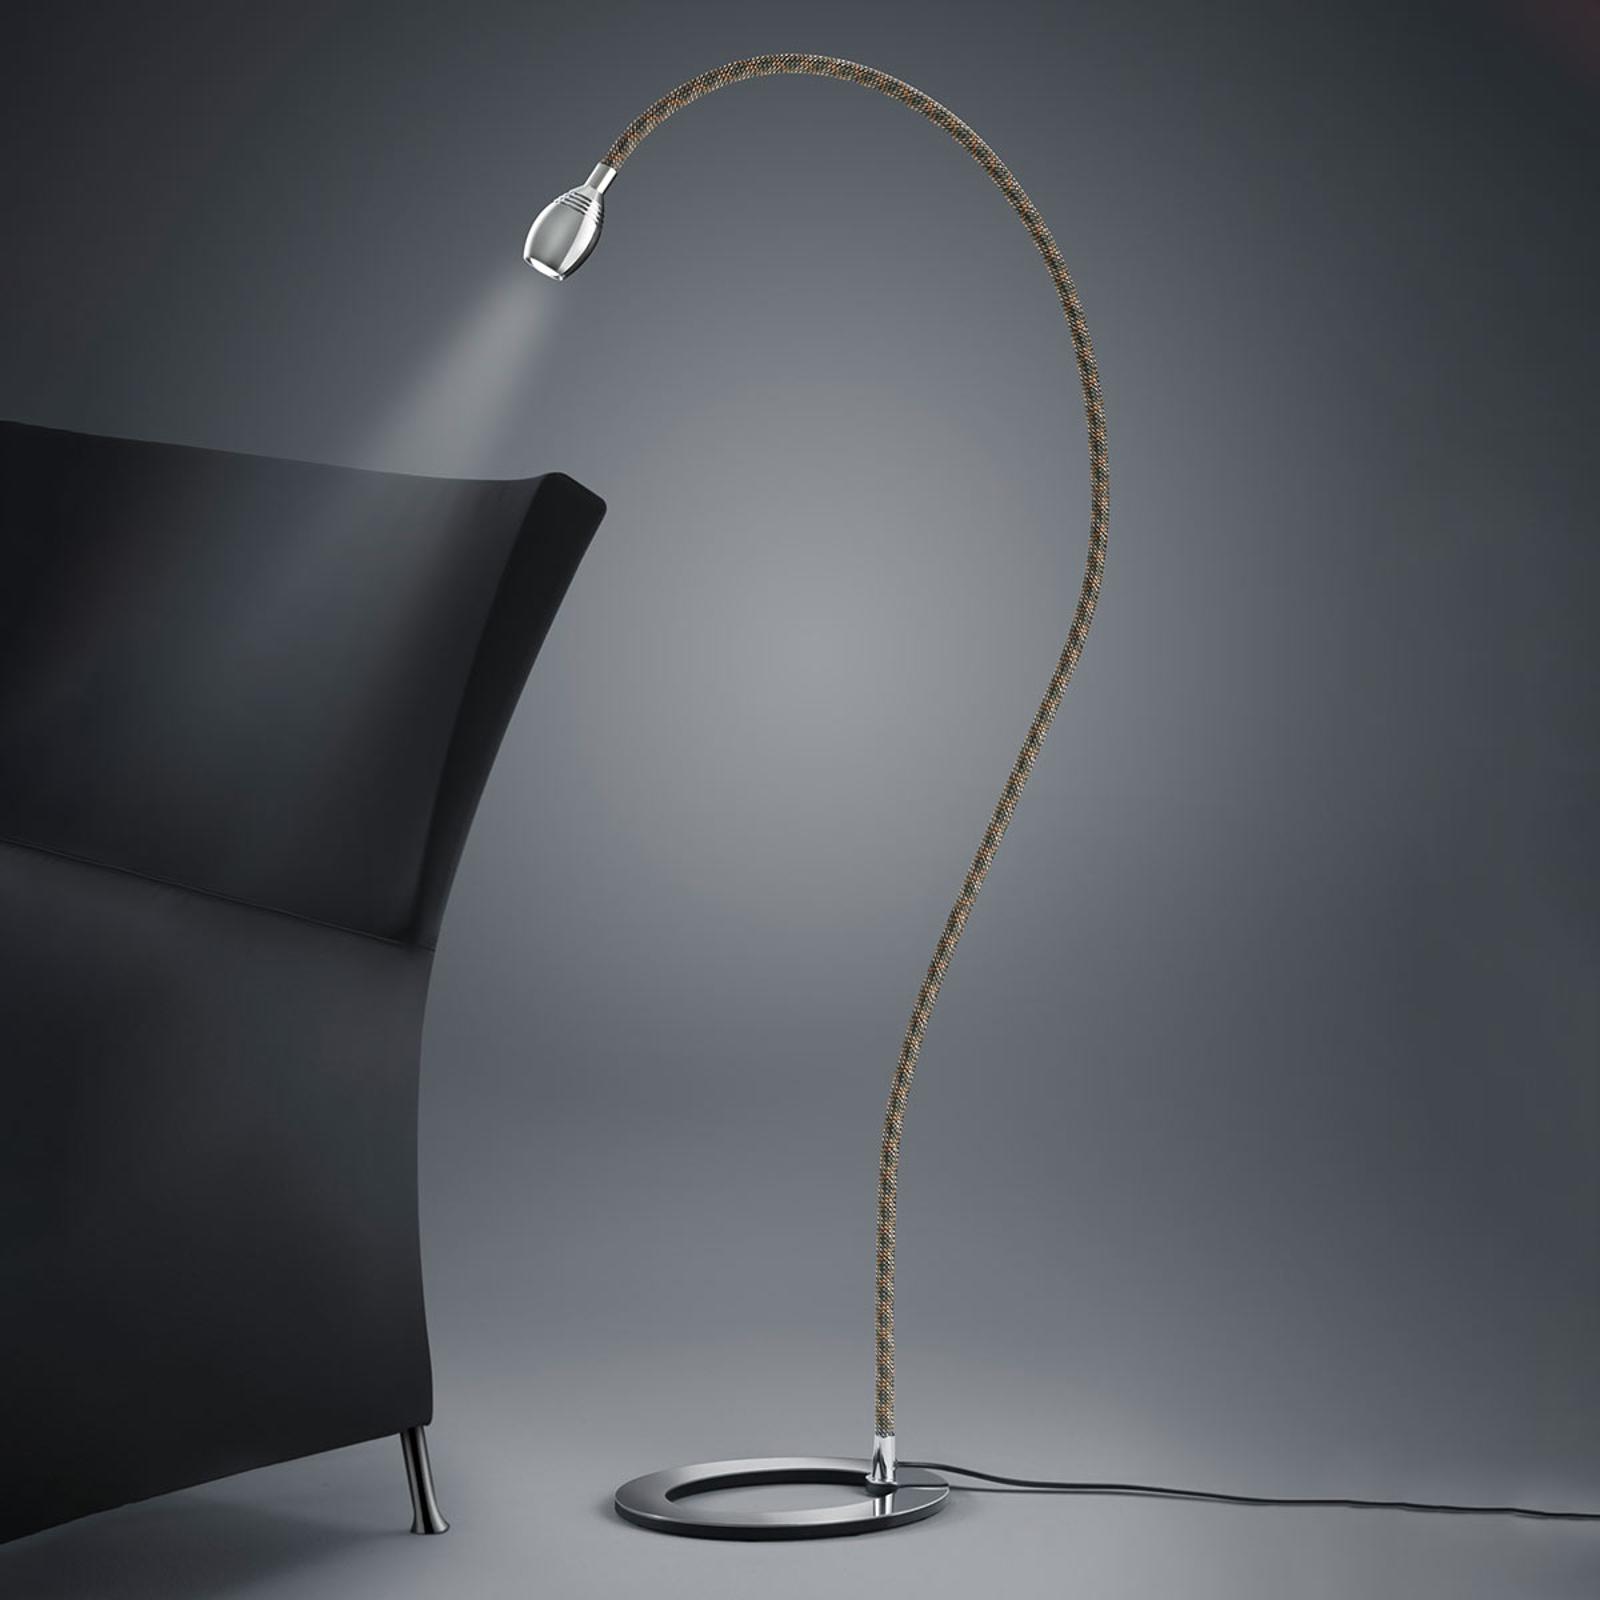 Baulmann 24.345 LED-Stehlampe Flexarm camouflage